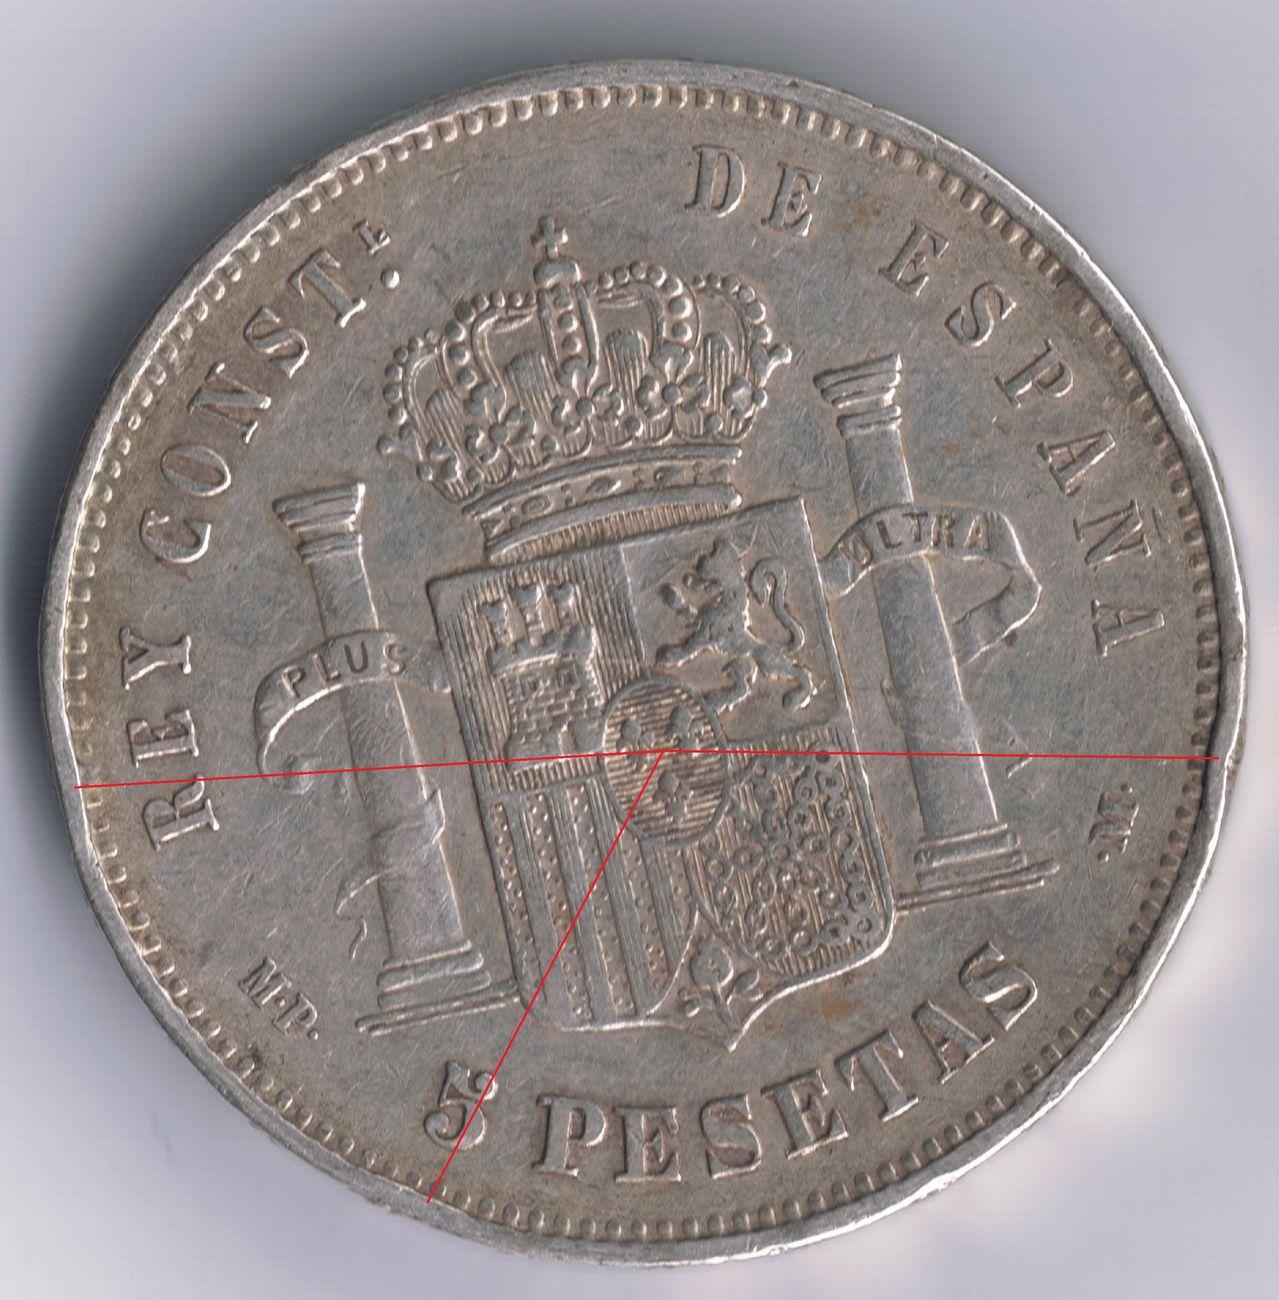 5 pesetas 1888 Alfonso XIII - Página 4 1888_36_perlas_rev